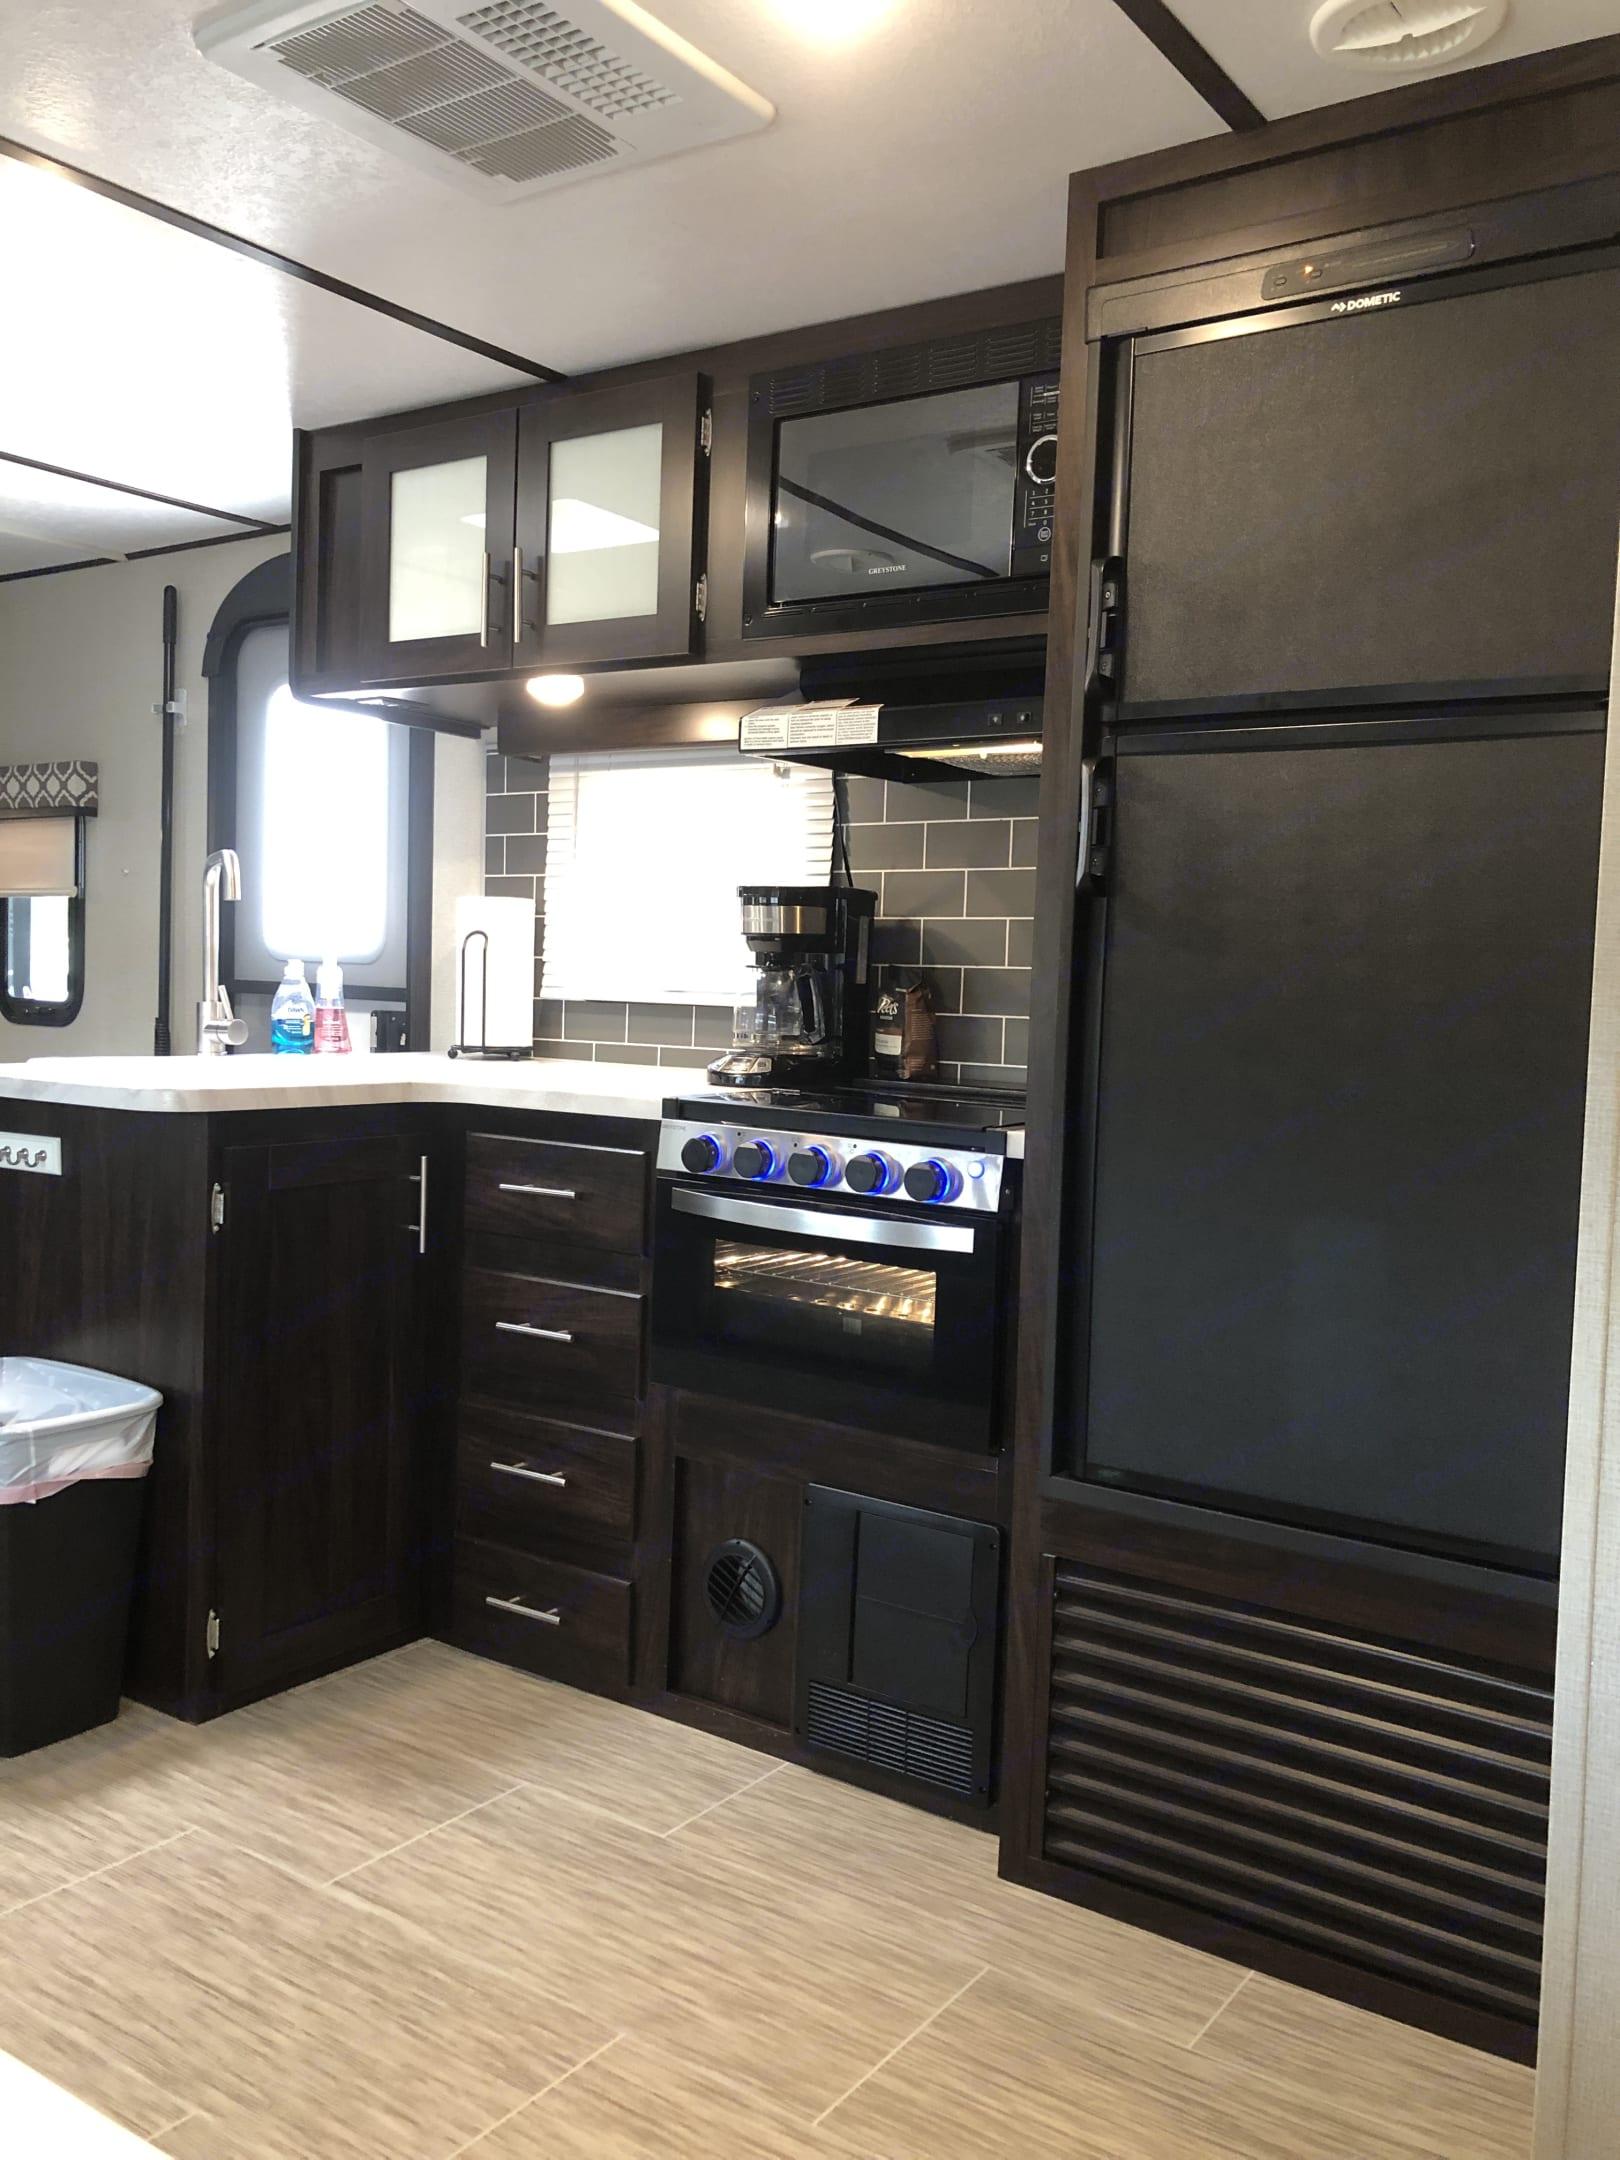 Kitchen. Prime Time Tracer 2019